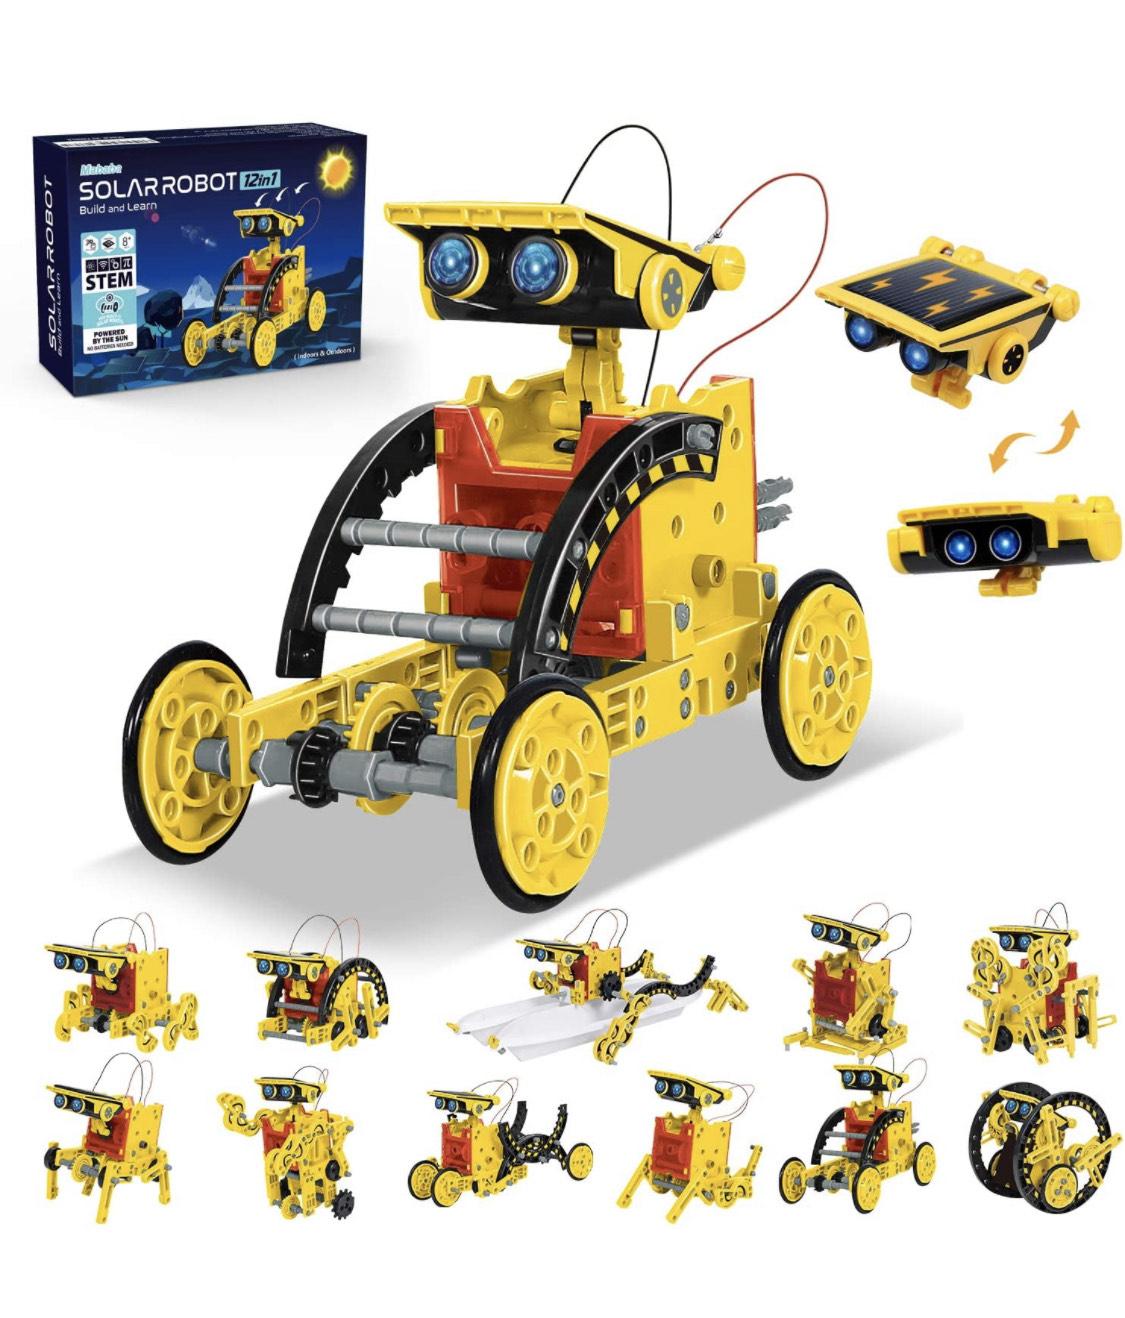 Kit de construcción de robot solar 12 en 1.